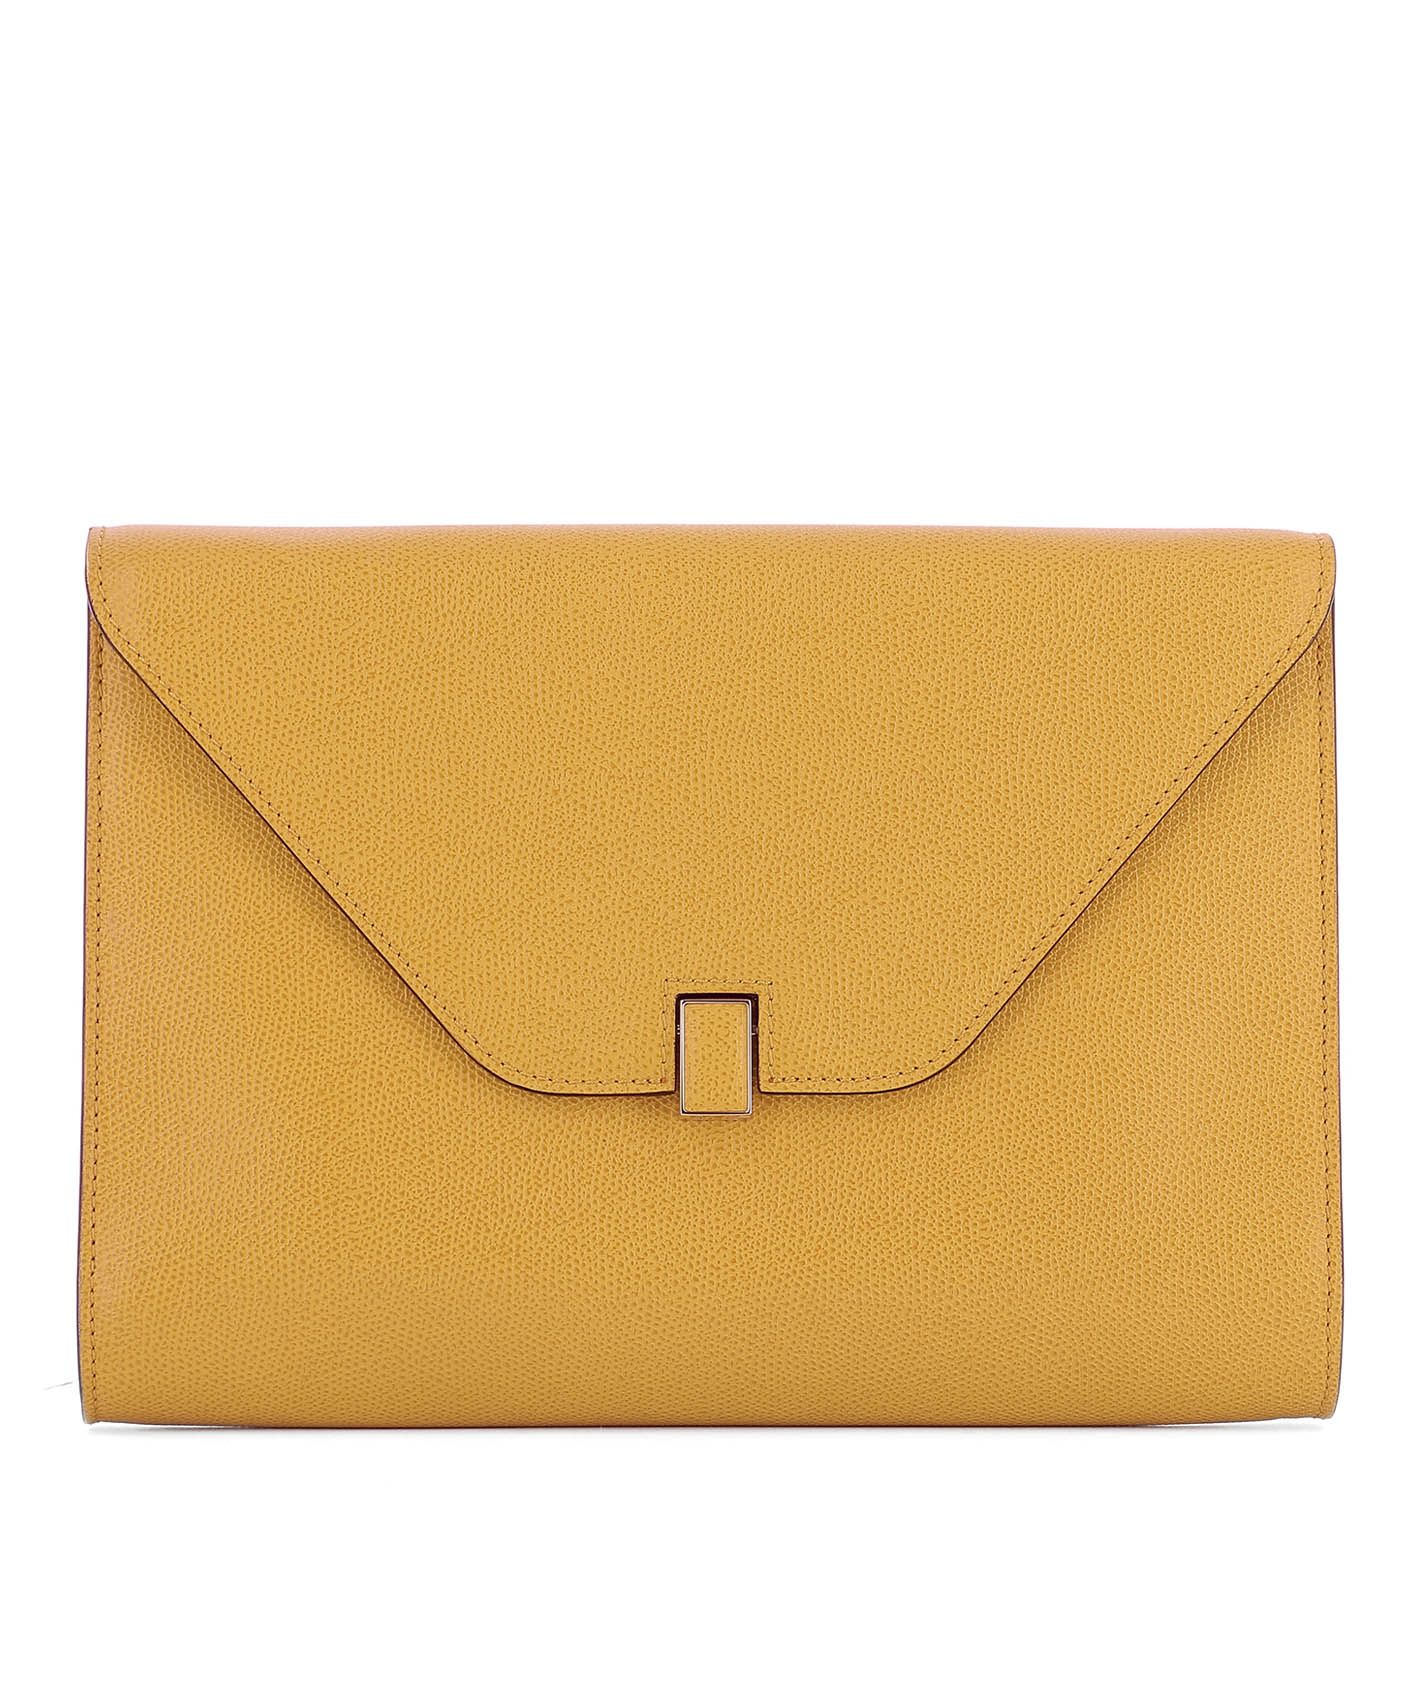 Yellow Leather Pochette